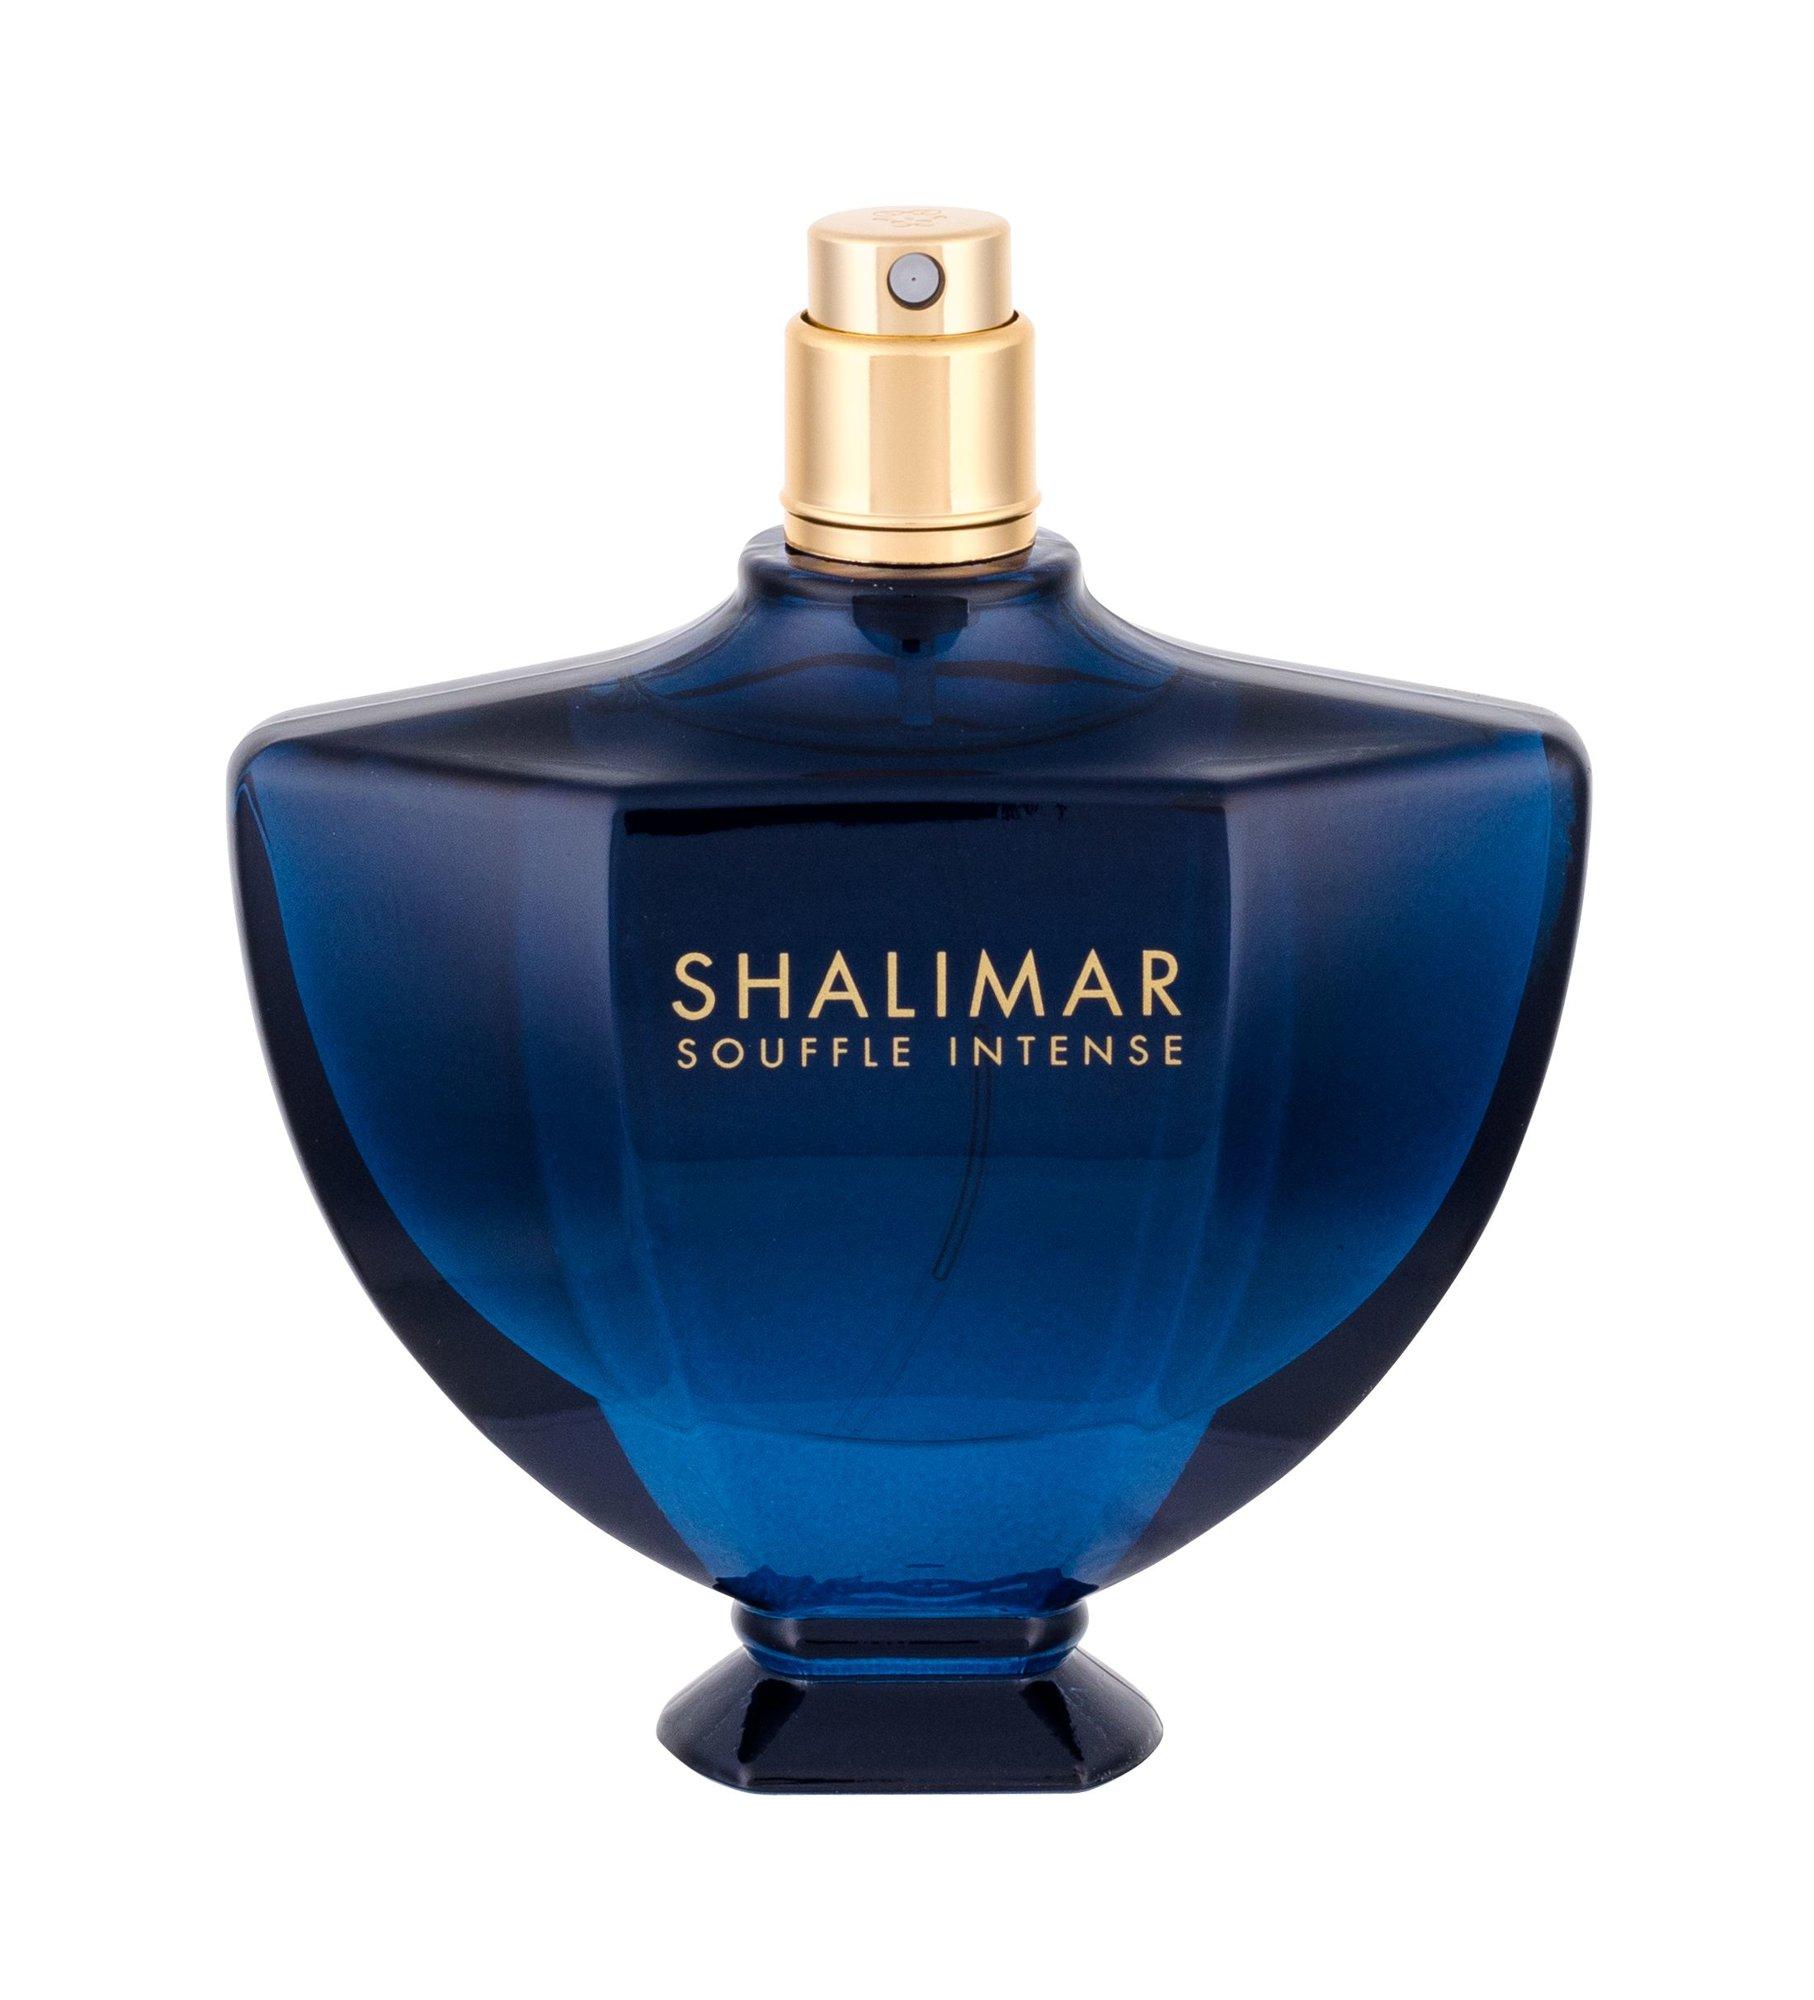 Guerlain Shalimar Souffle Intense EDP 50ml